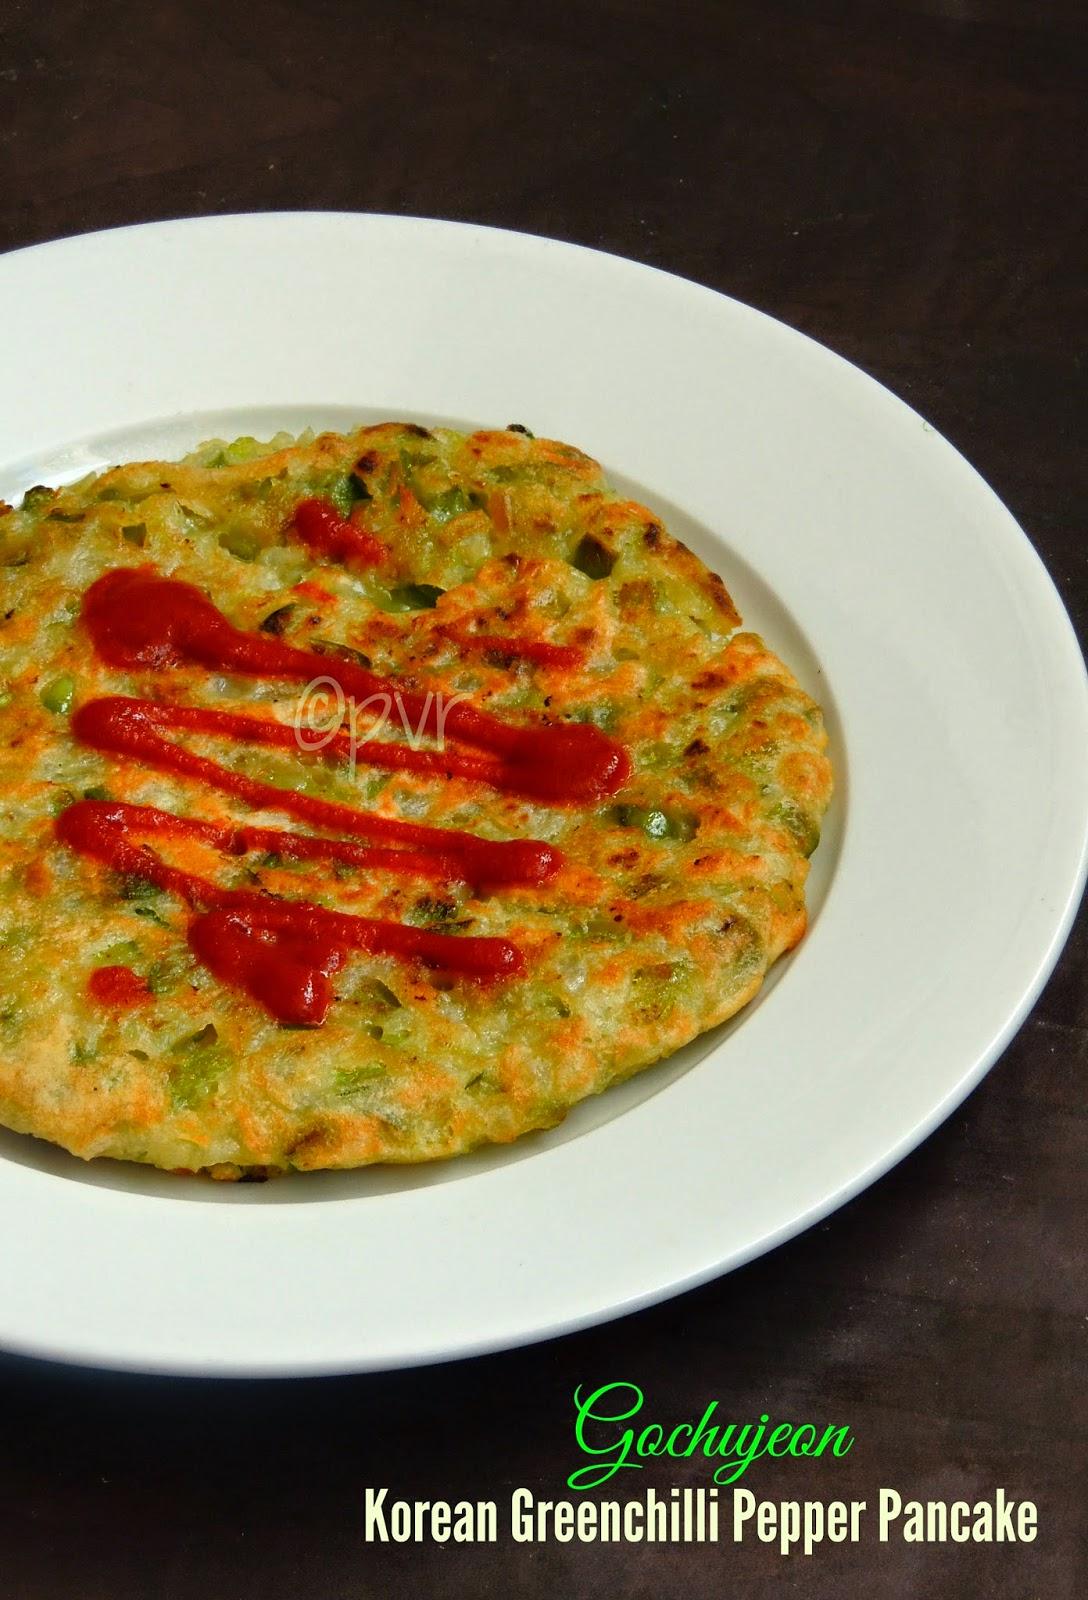 Korean Green chilli pepper pancake, Gochujeon,Eggless korean pancake